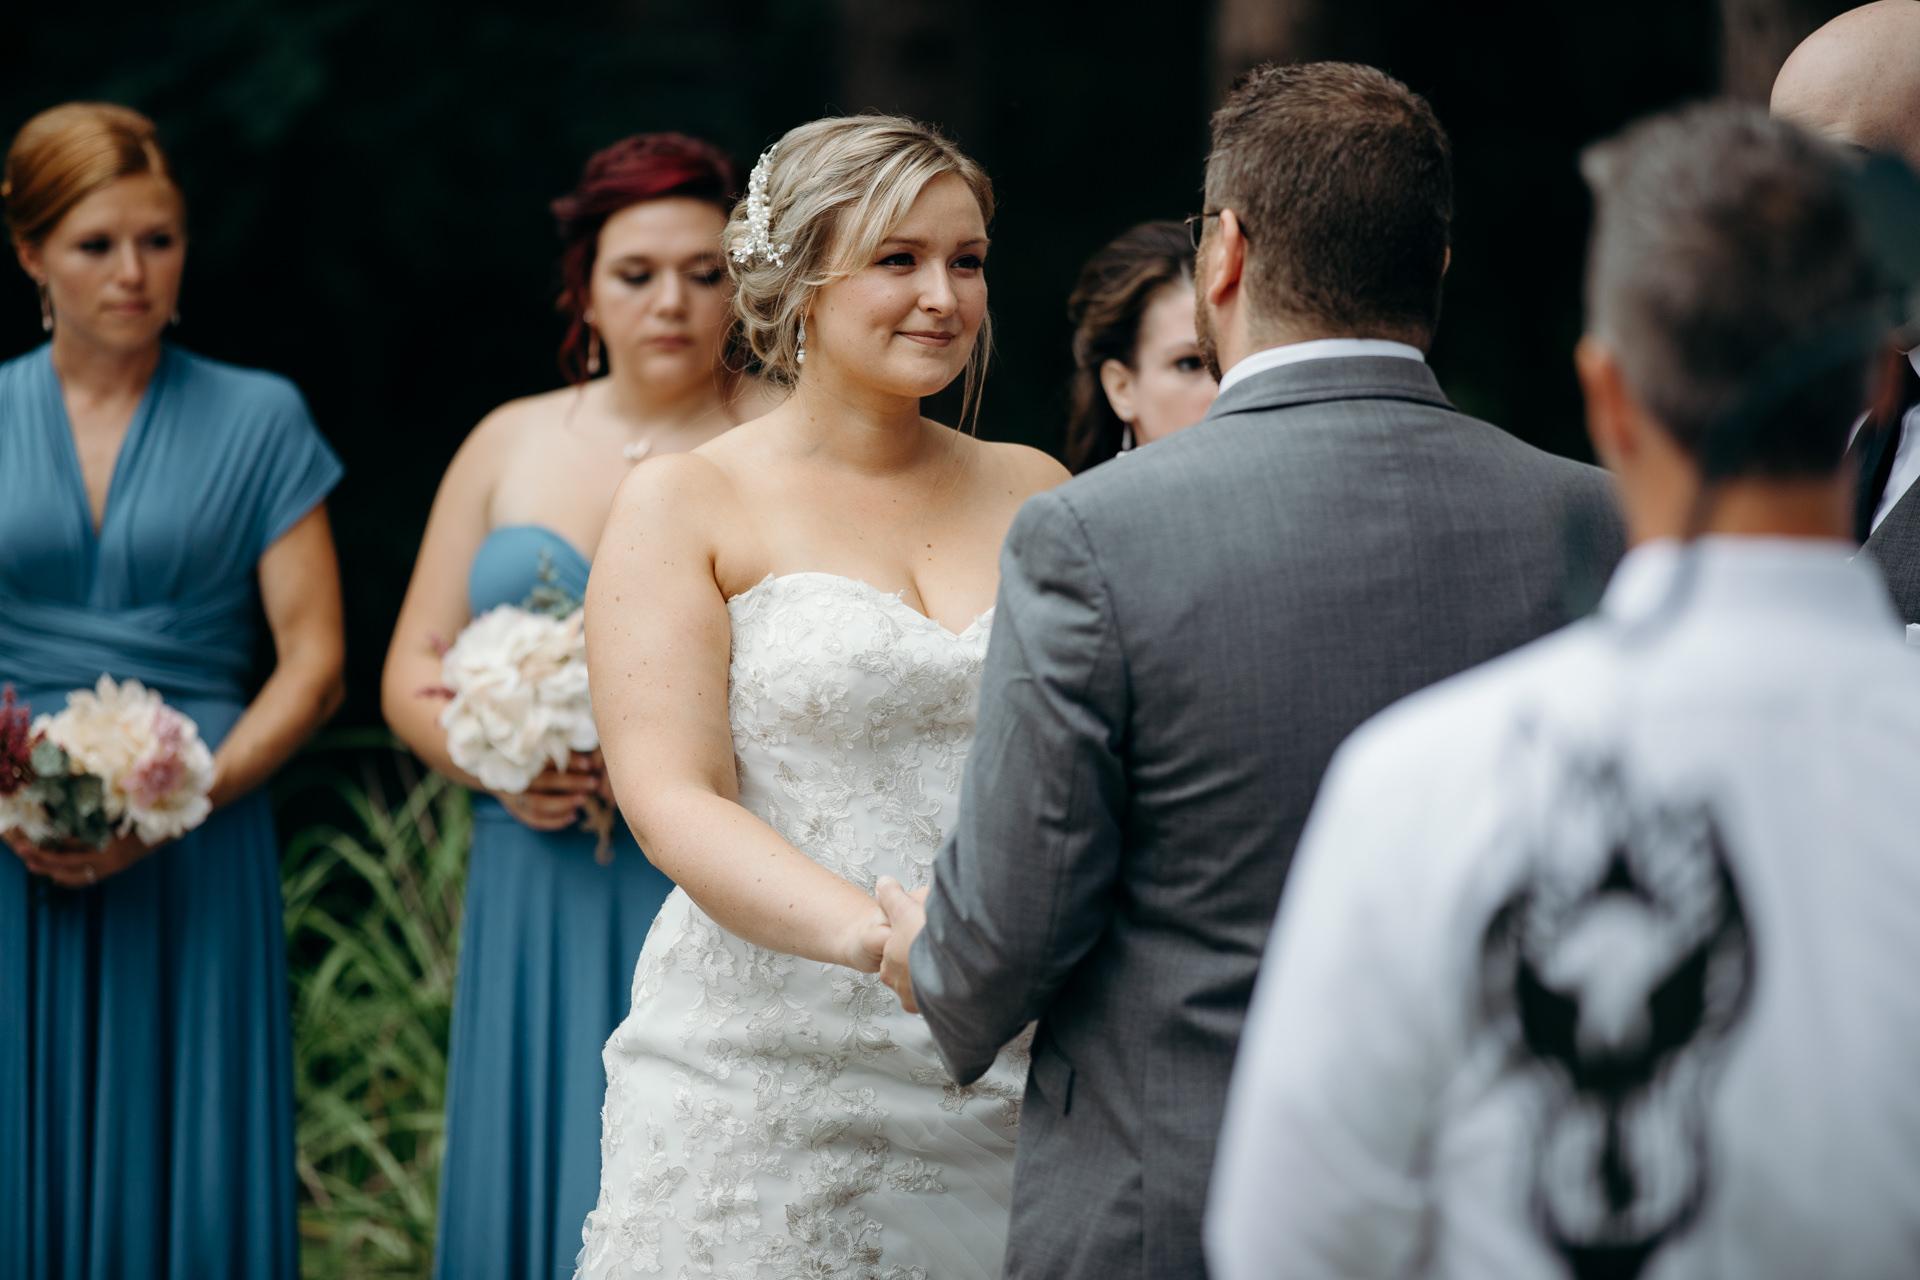 Grant Beachy Weddings photography elkhart south bend goshen warsaw-033.jpg